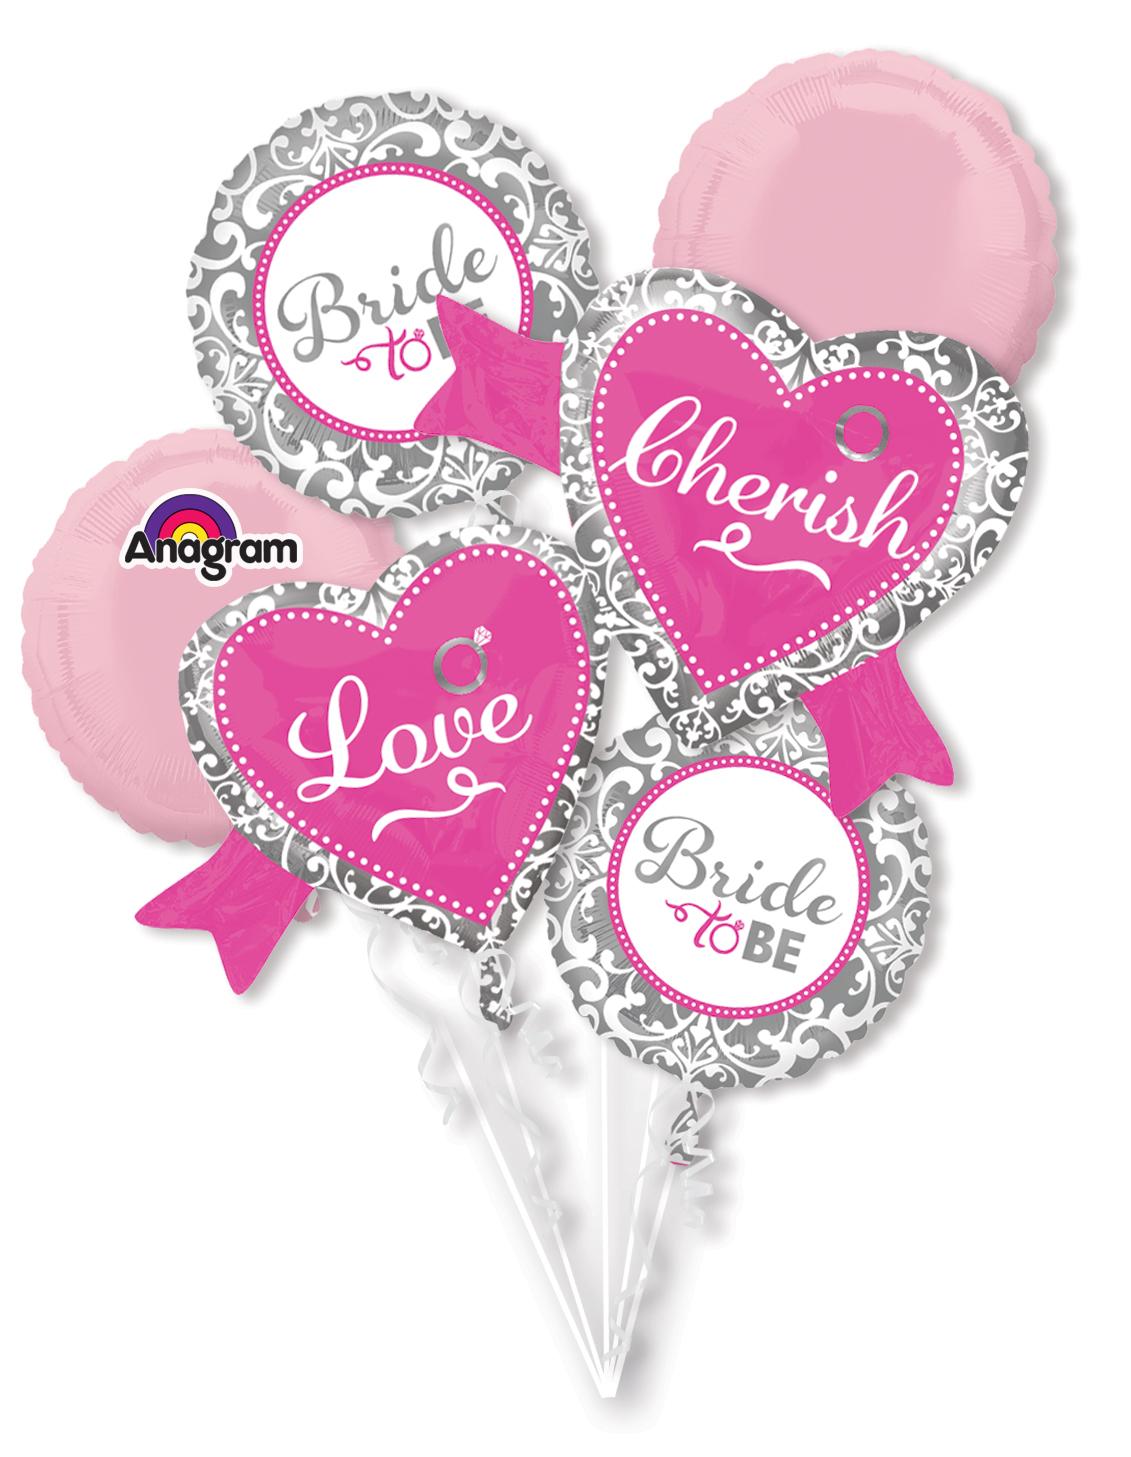 Bouquet Elegant Bride Balloon Packaged